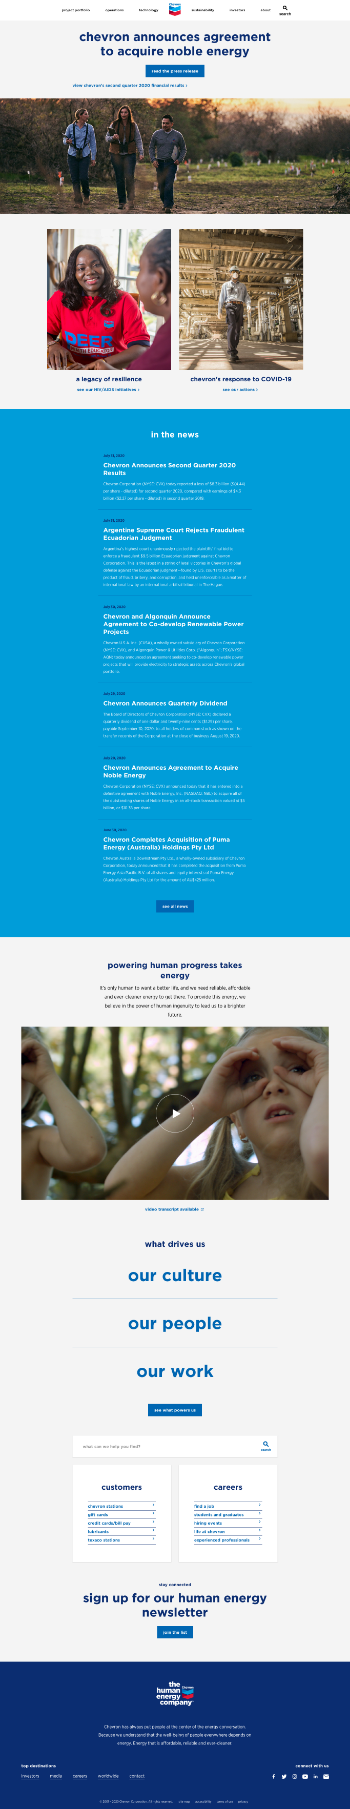 Chevron Corporation Website Screenshot